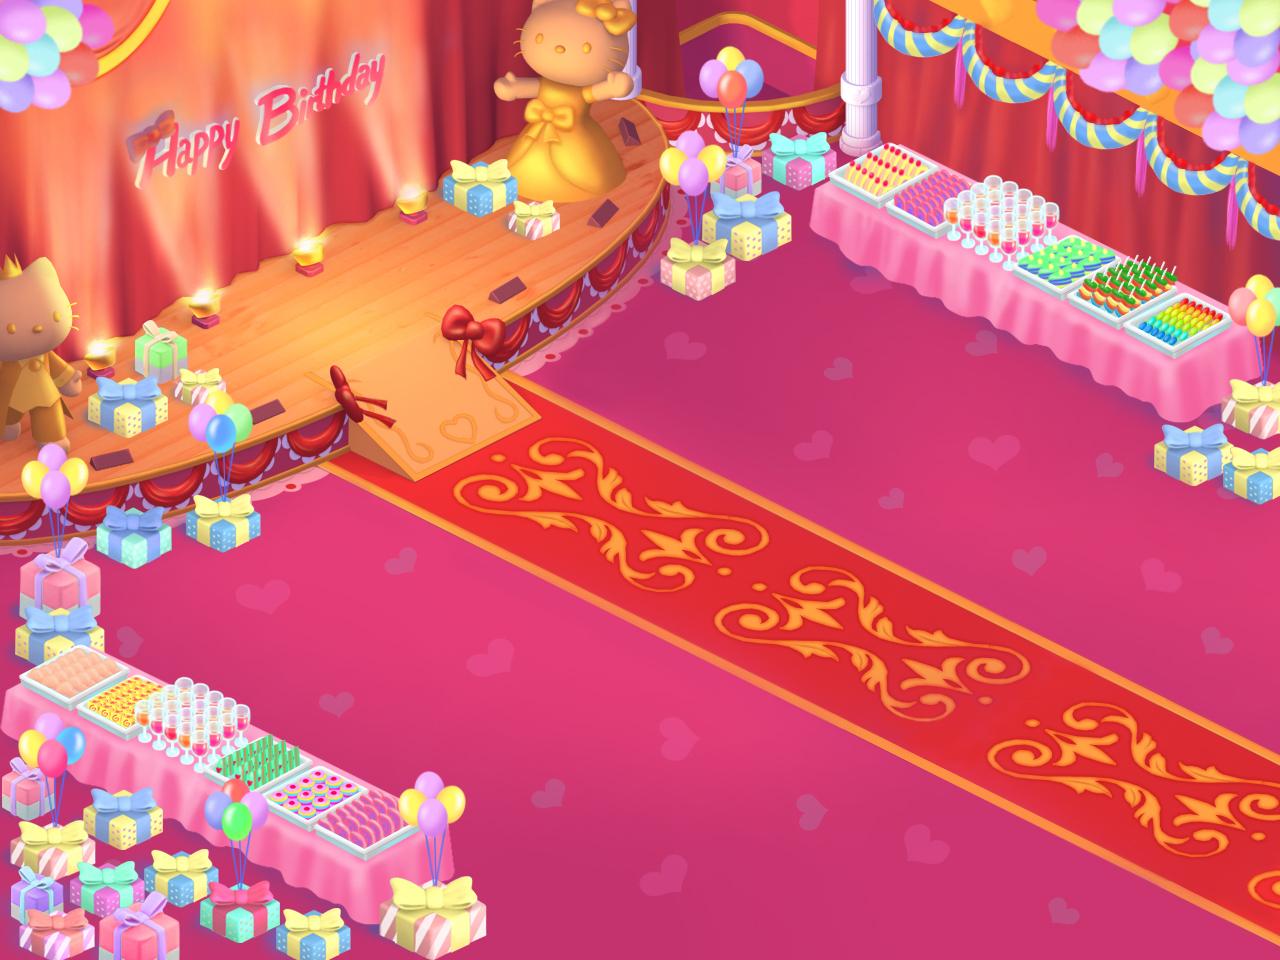 Popular Wallpaper Hello Kitty Room - Hello-Kitty-s-Birthday-Party-Room-hello-kitty-online-2878103-1280-960  You Should Have_605811.jpg